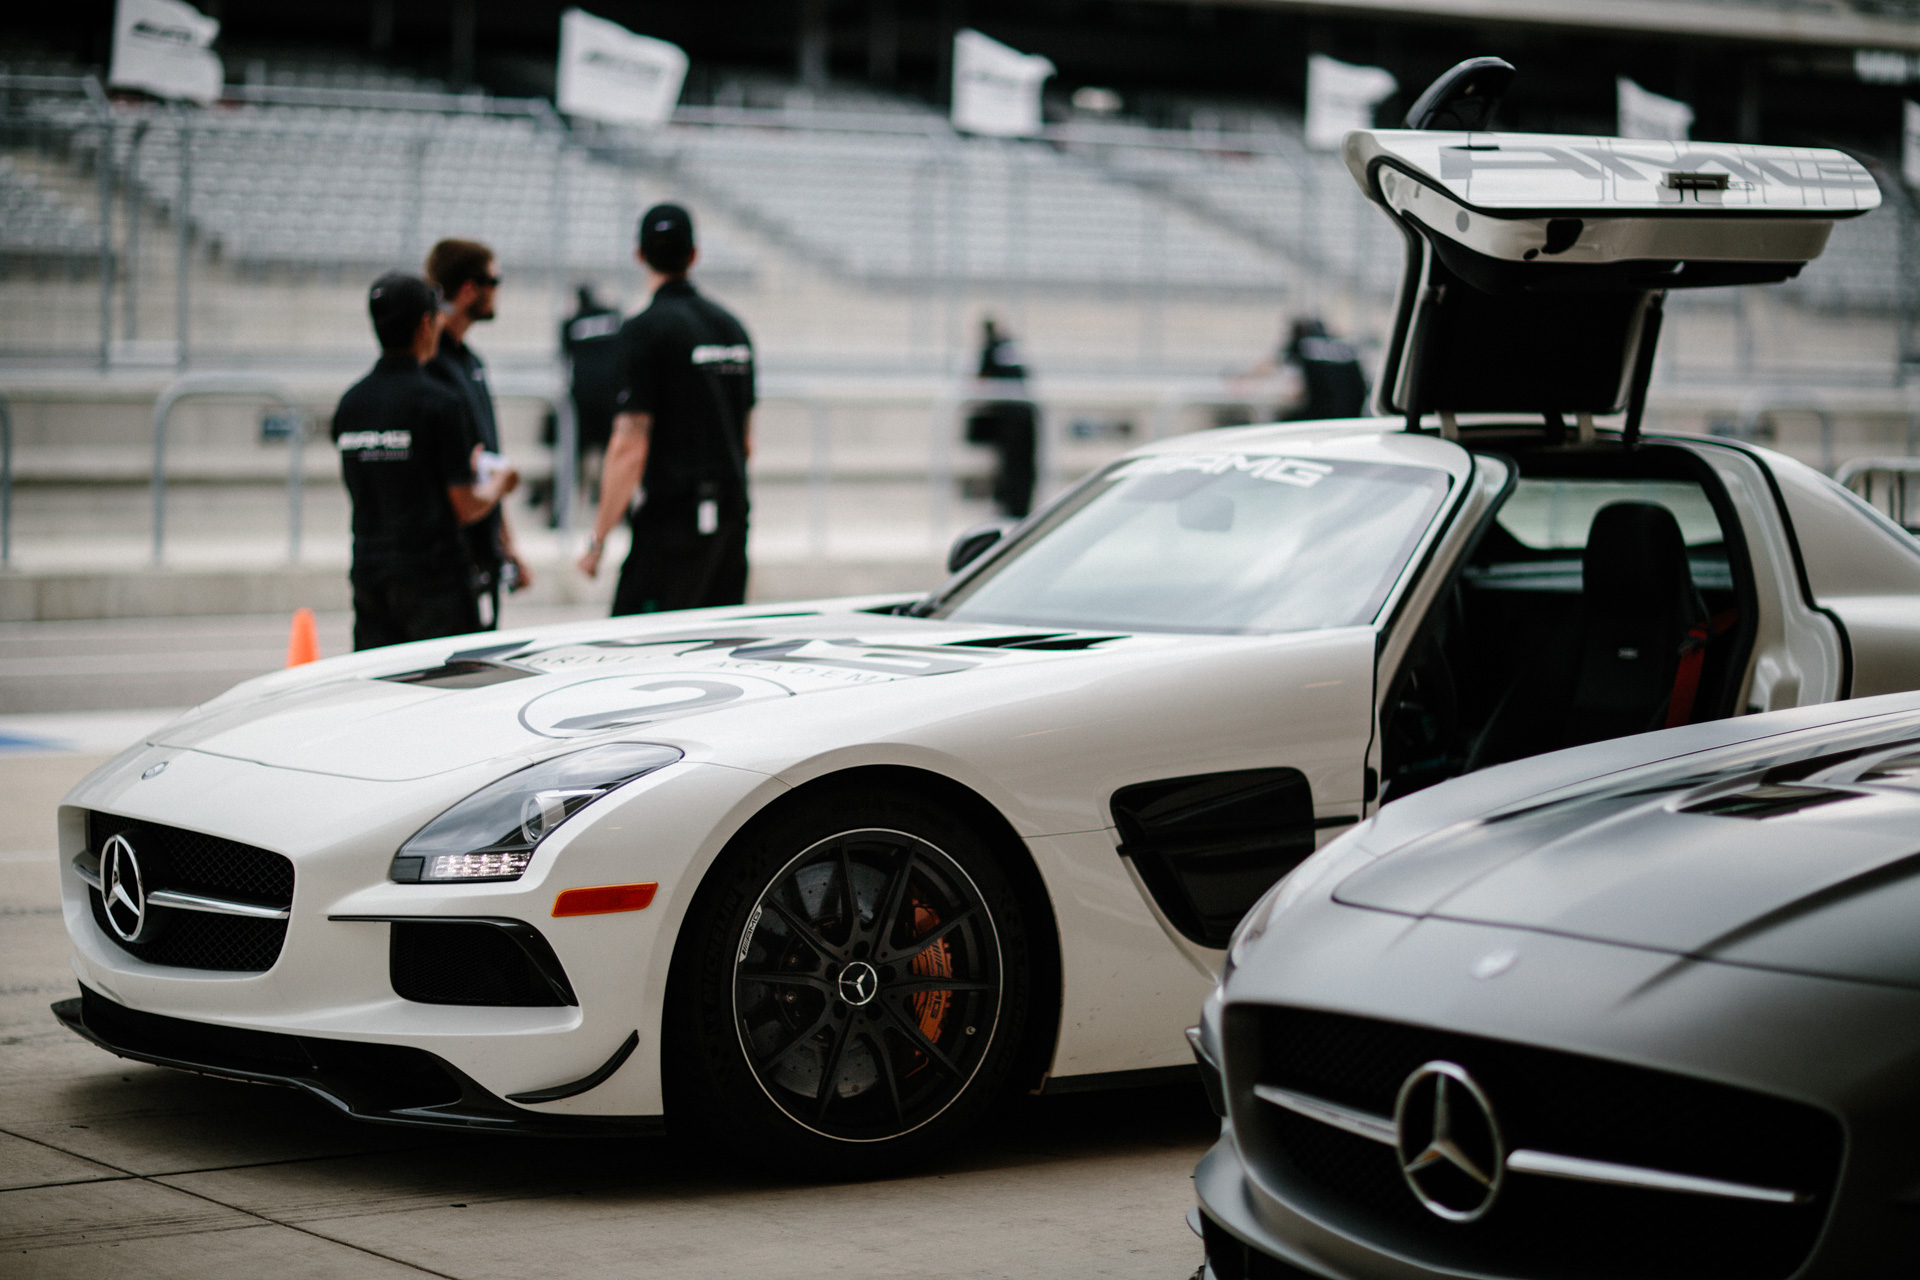 Mercedes_Benz_AMG_2017_Edits (18 of 23).jpg